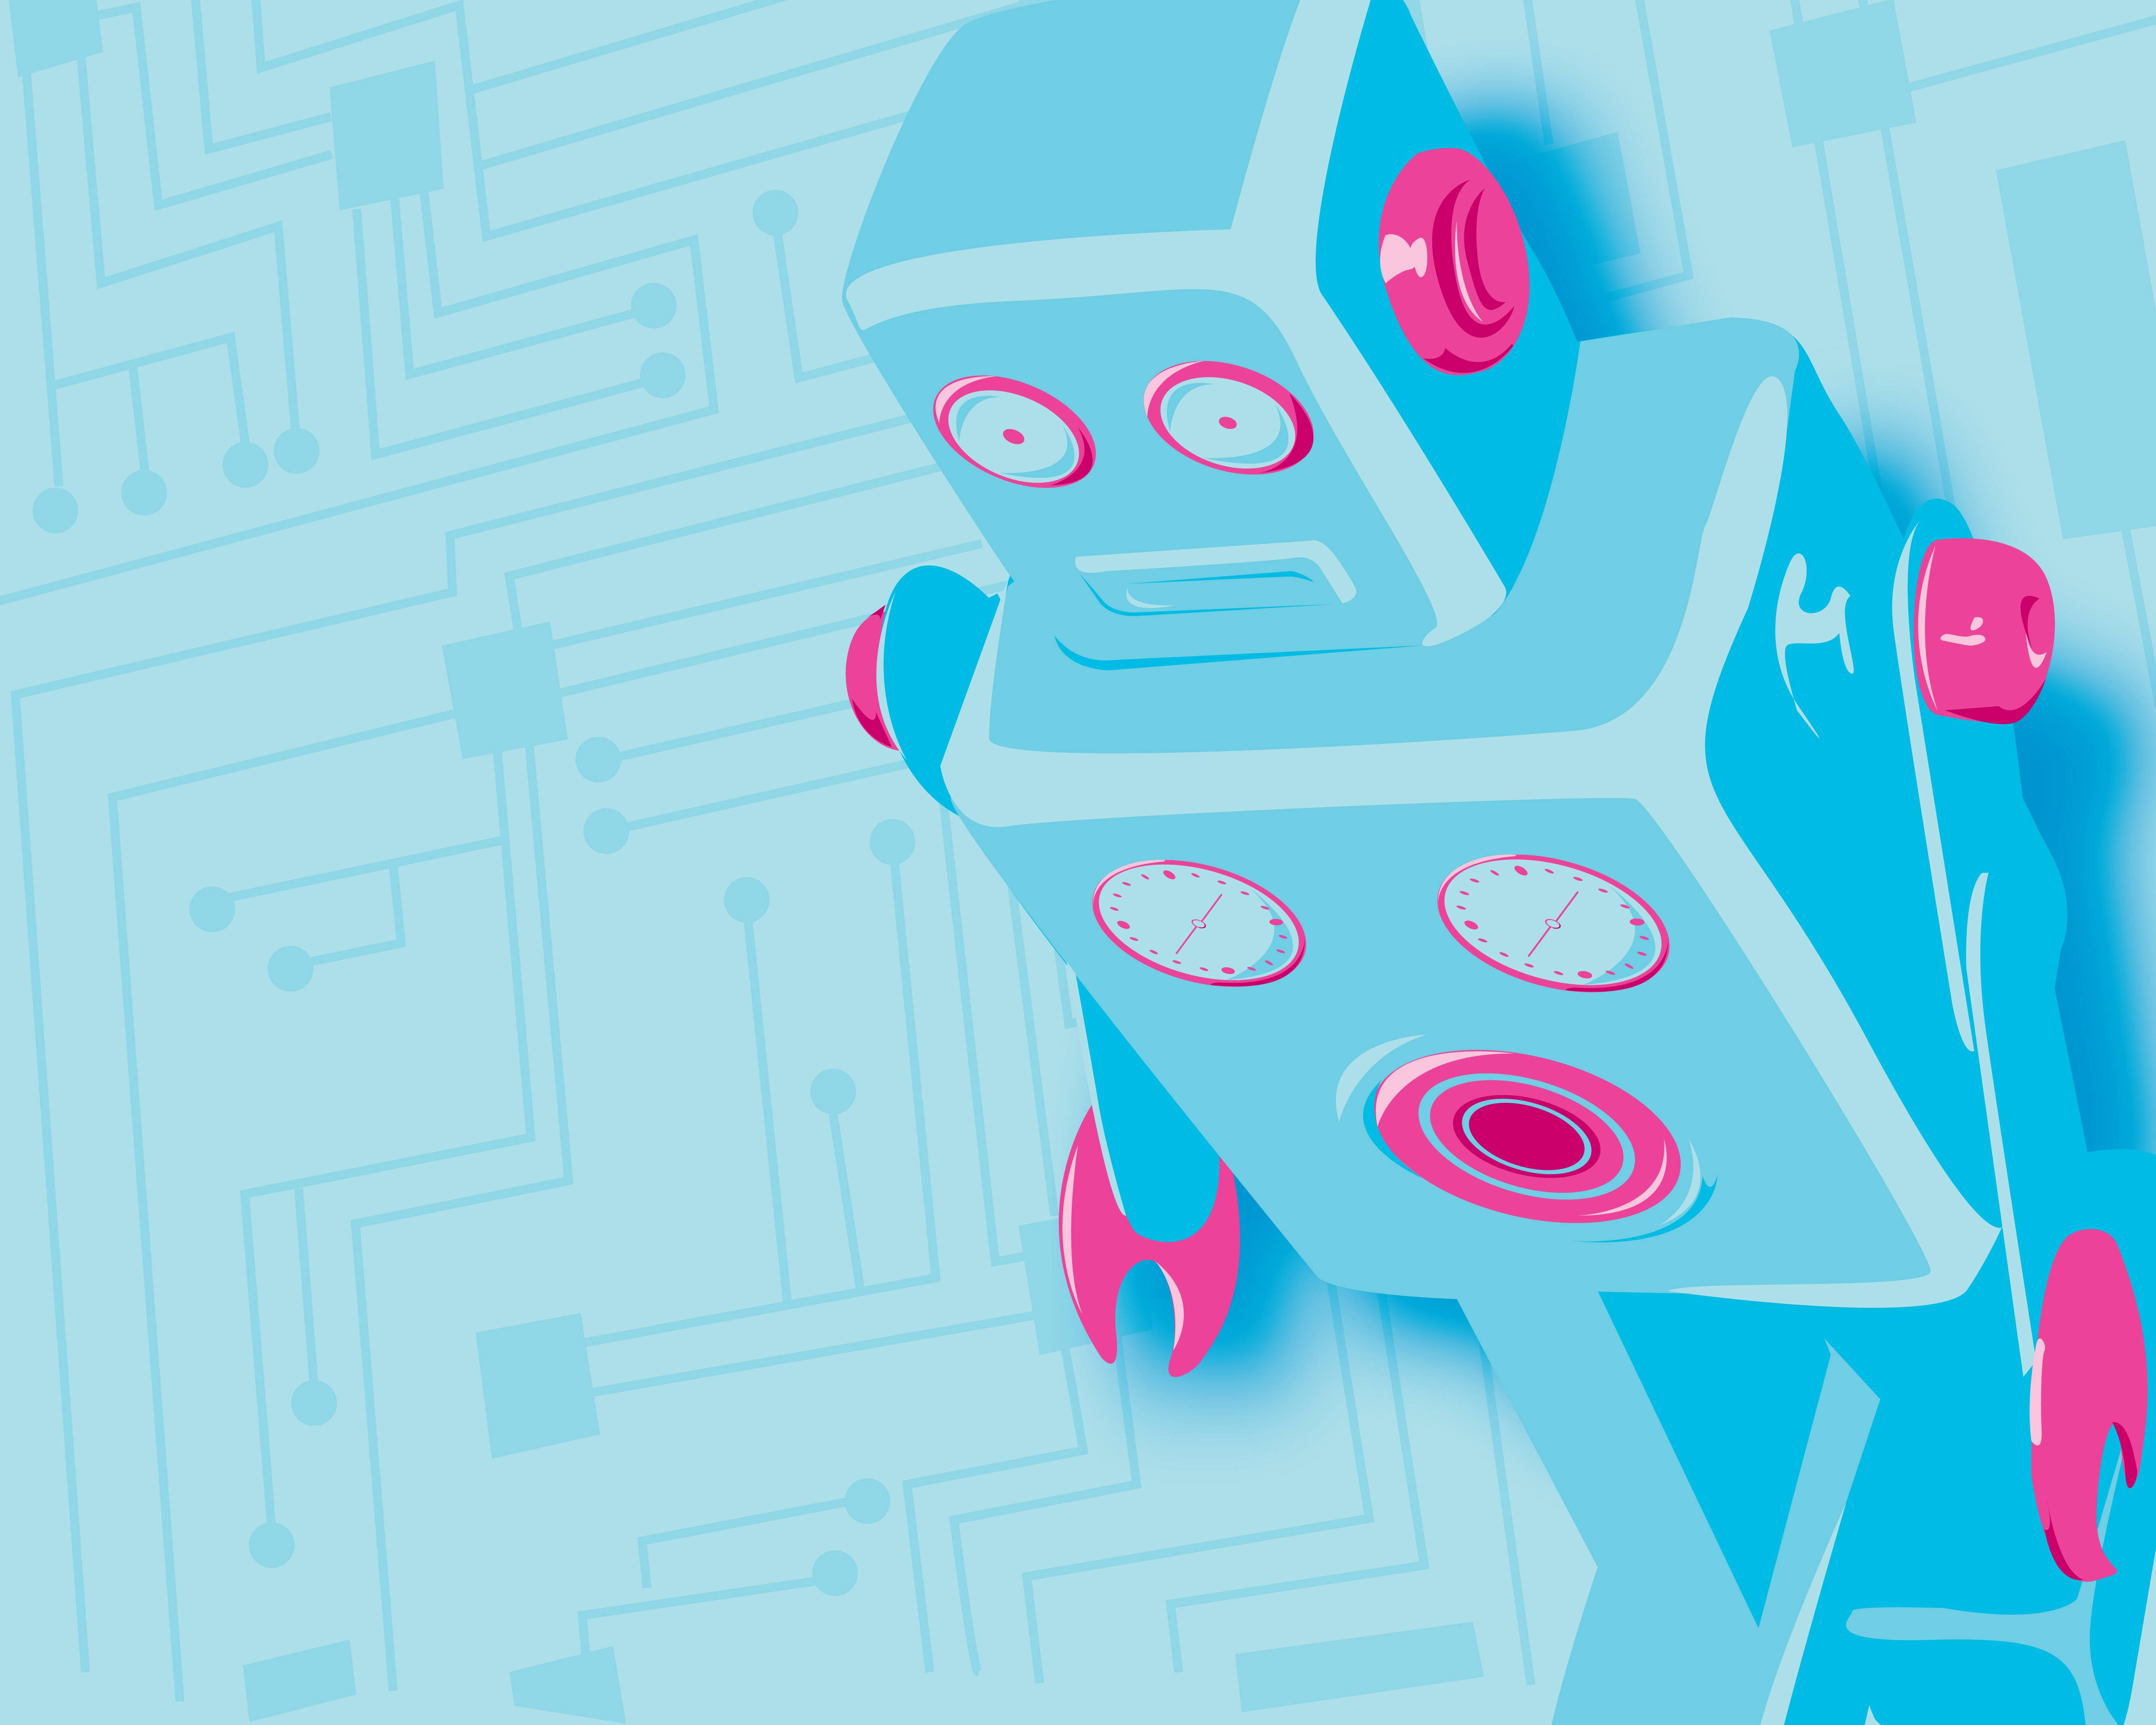 Robot Wallpapers - Wallpaper Cave